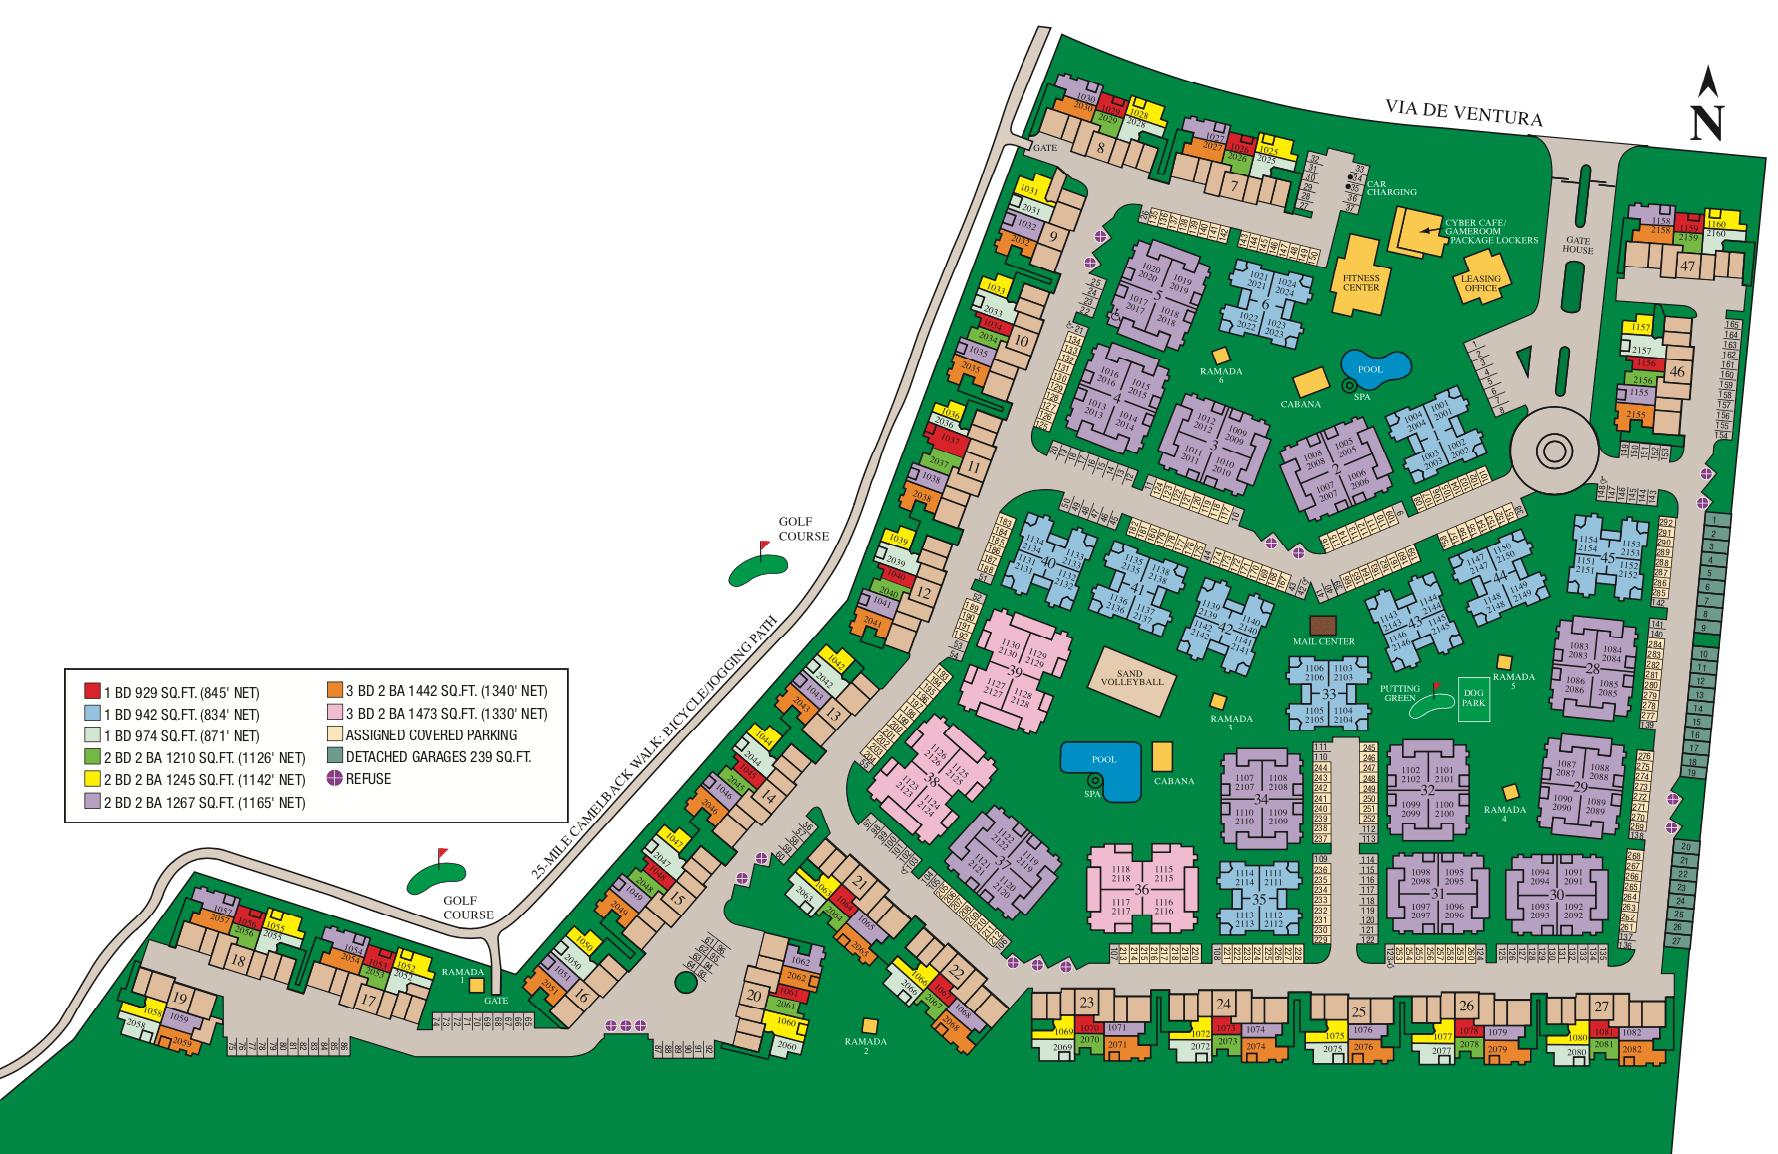 Site map of San Antigua in McCormick Ranch in Scottsdale, AZ